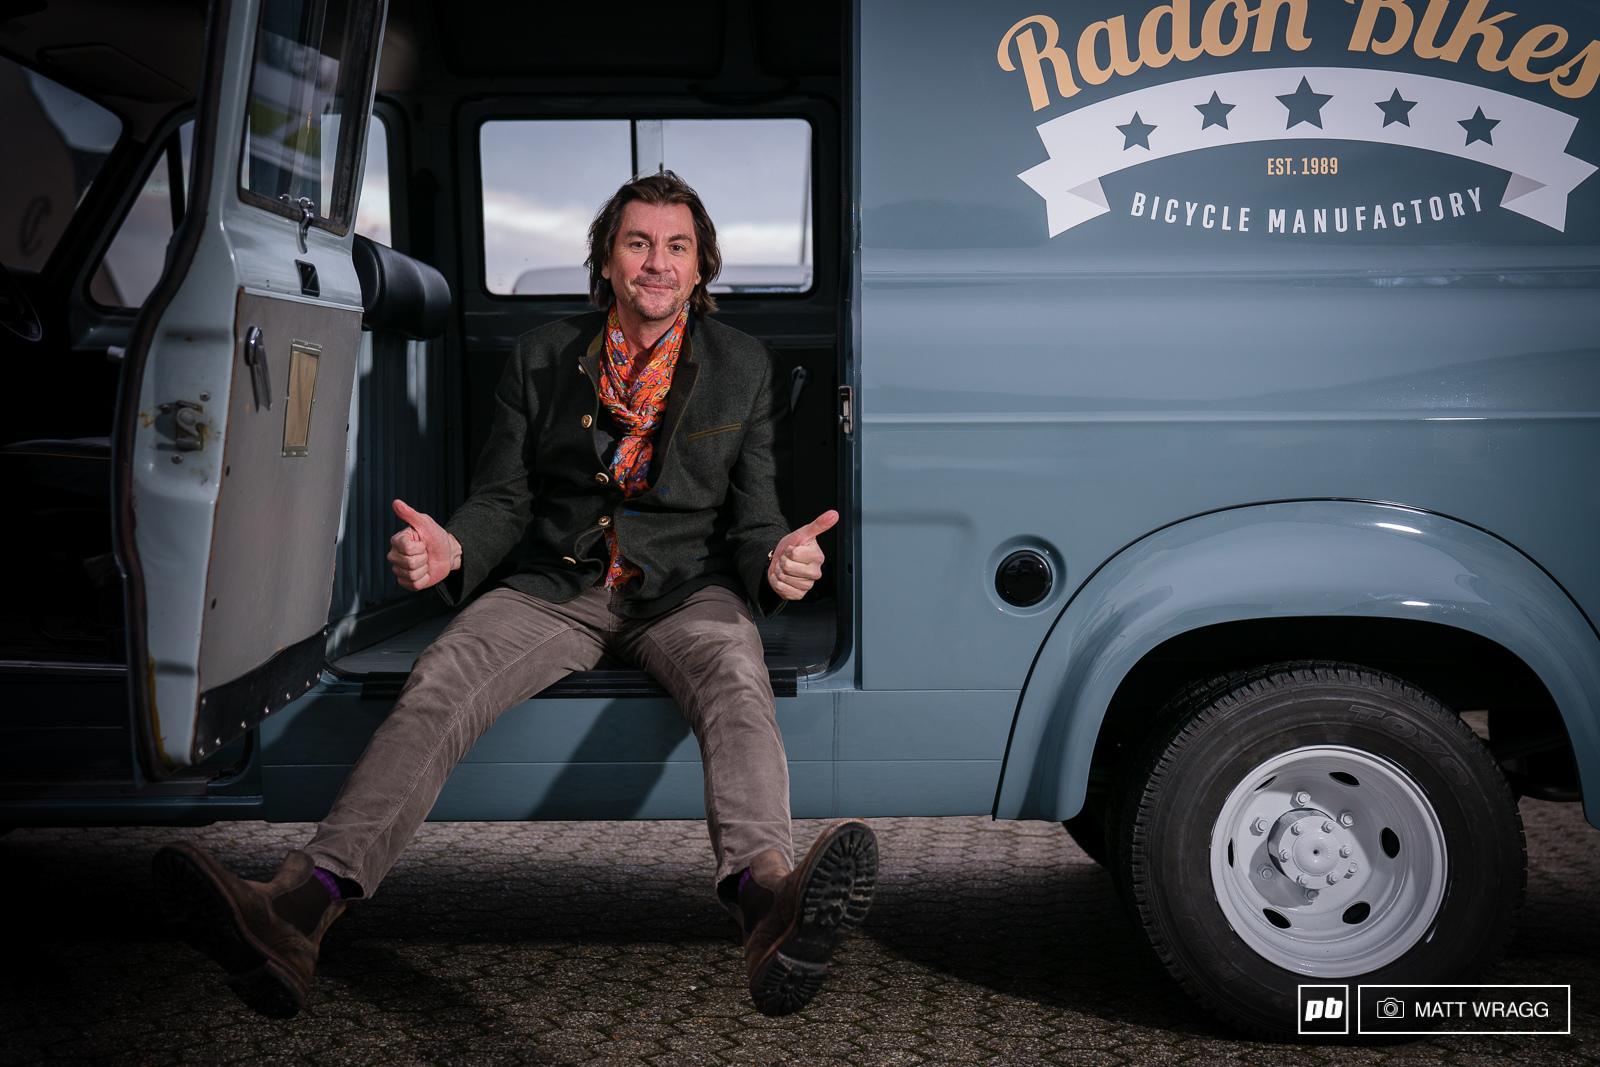 Radon Chris Stahl